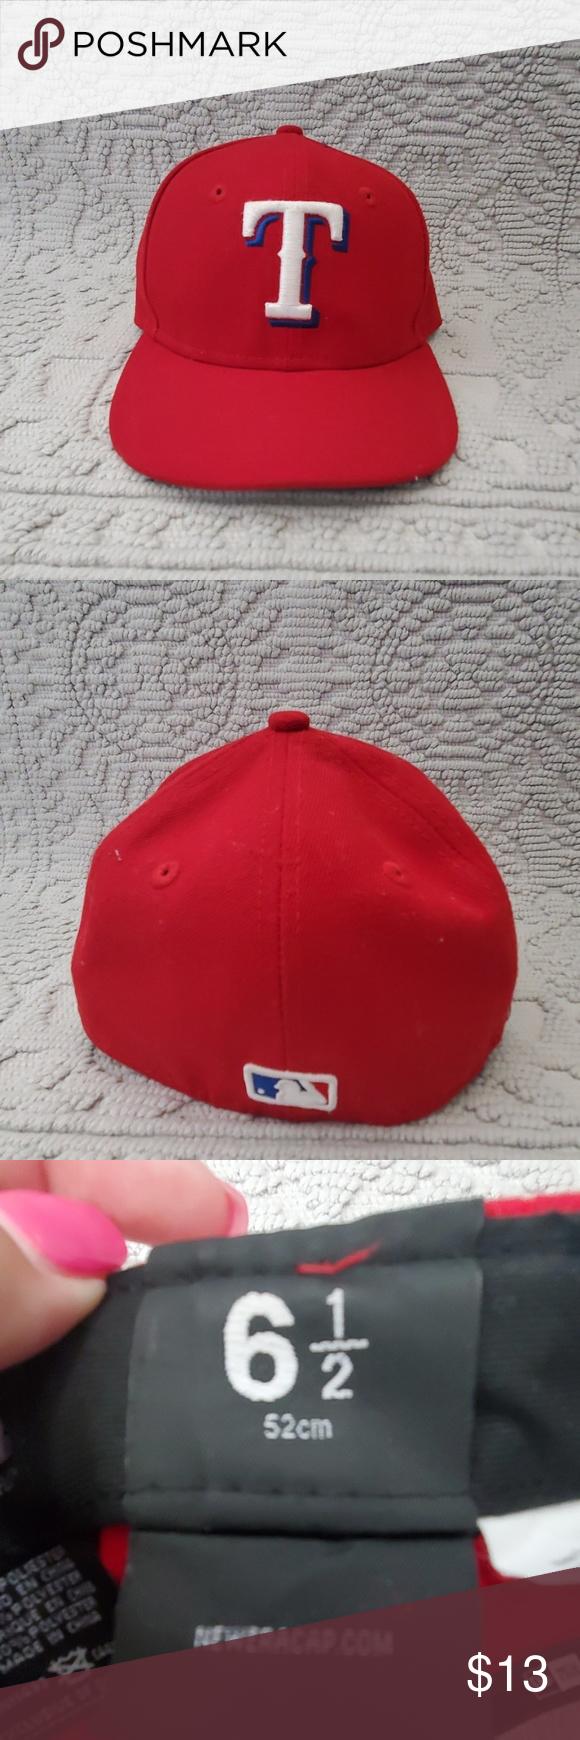 Kids Texas Rangers Hat In 2020 Kids Accessories Texas Rangers Texas Rangers Hat